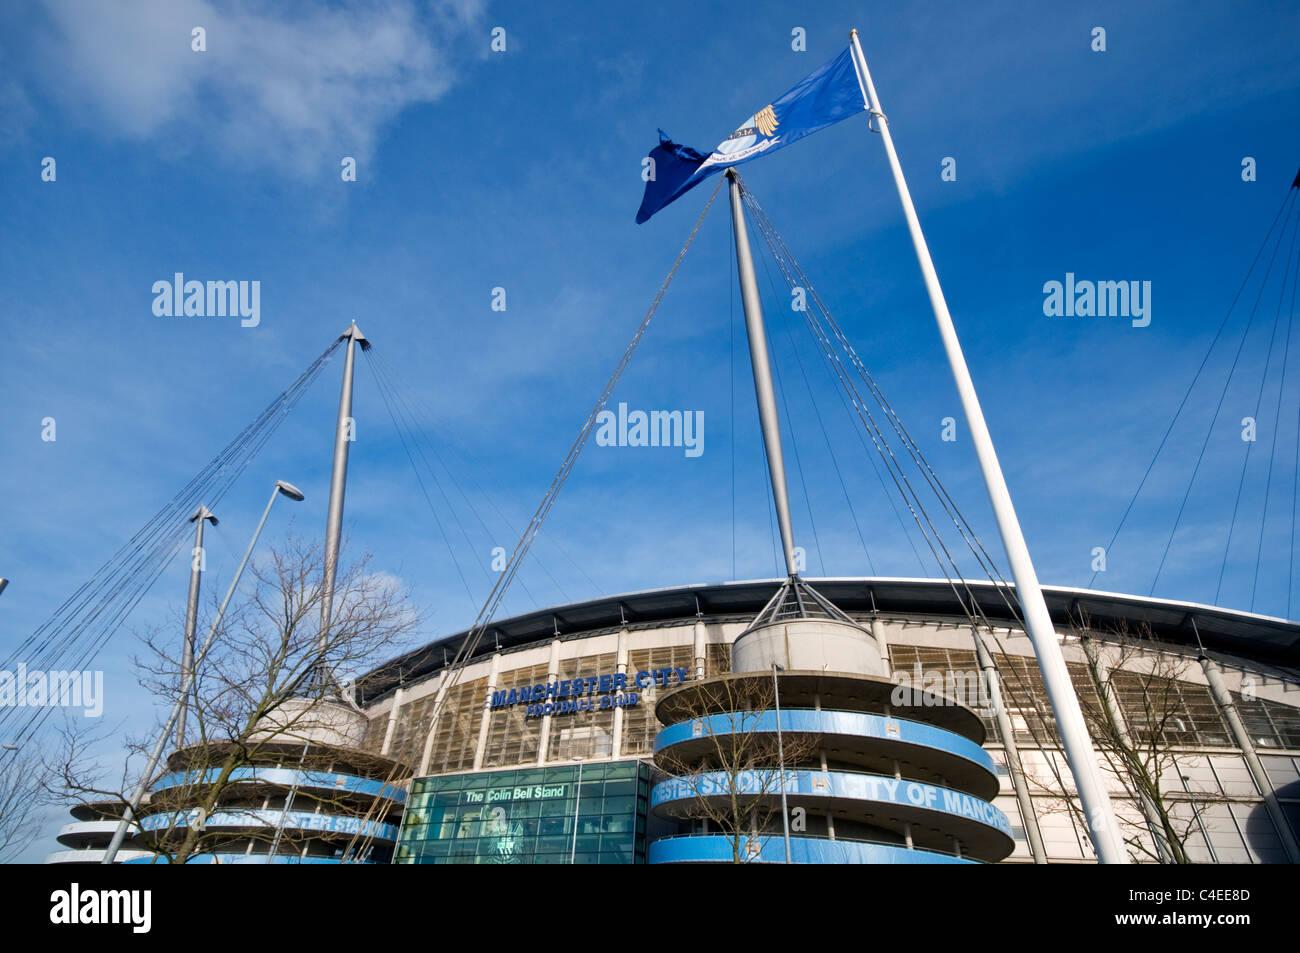 Manchester City's Etihad football stadium in England Stock Photo